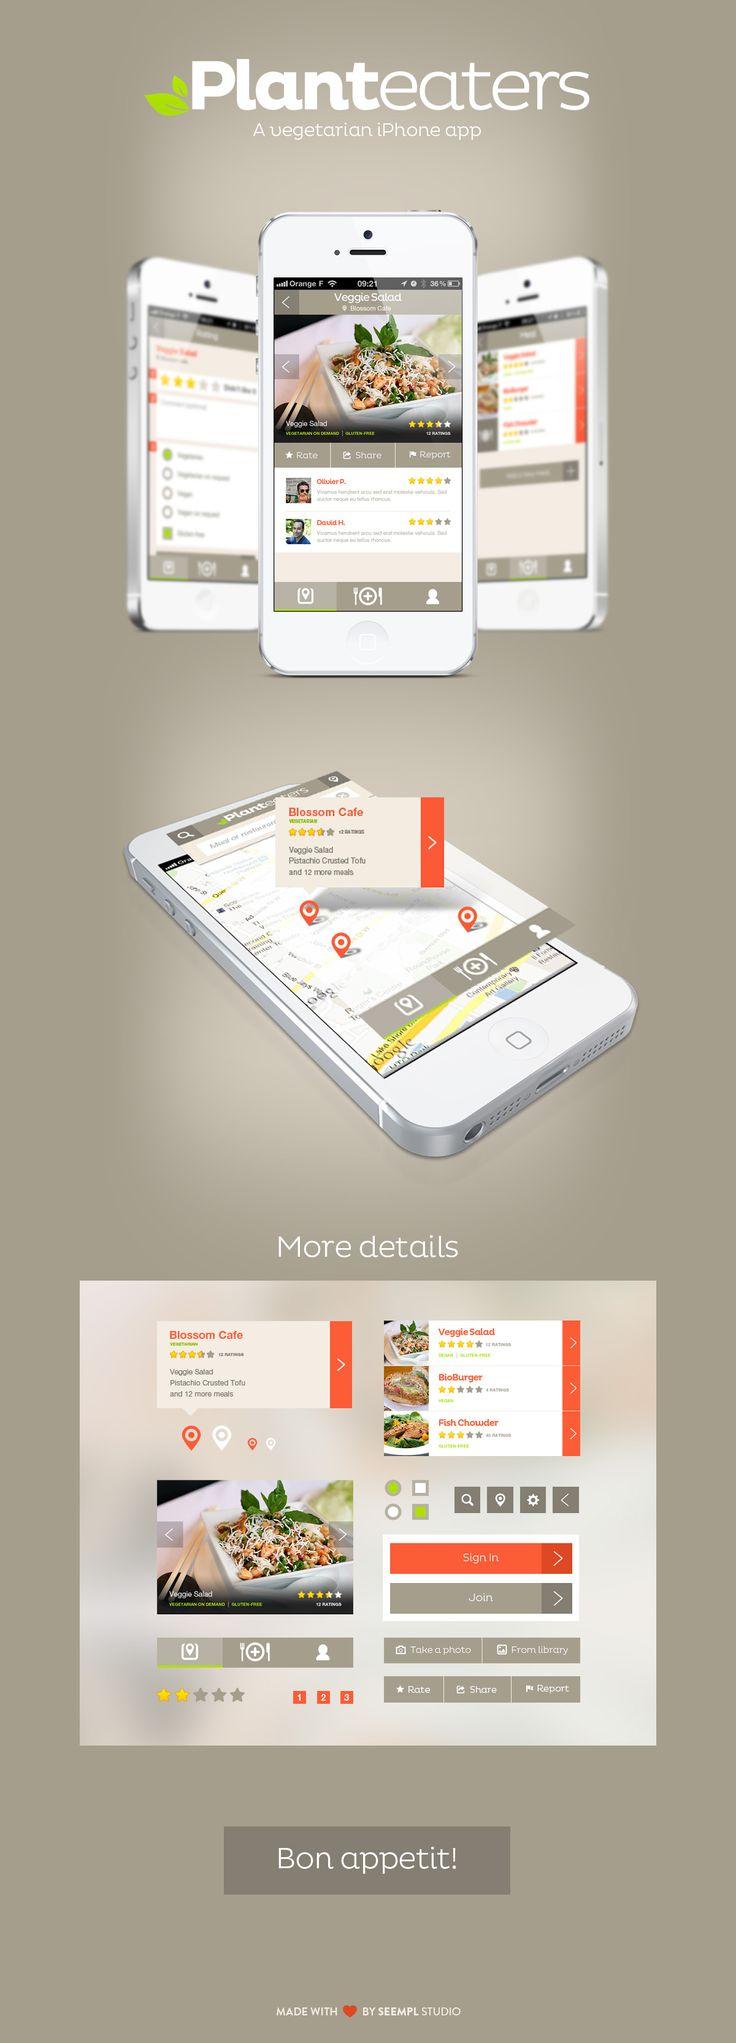 Planteaters | Seempl Studio #web #design #presentation #mobile #UI